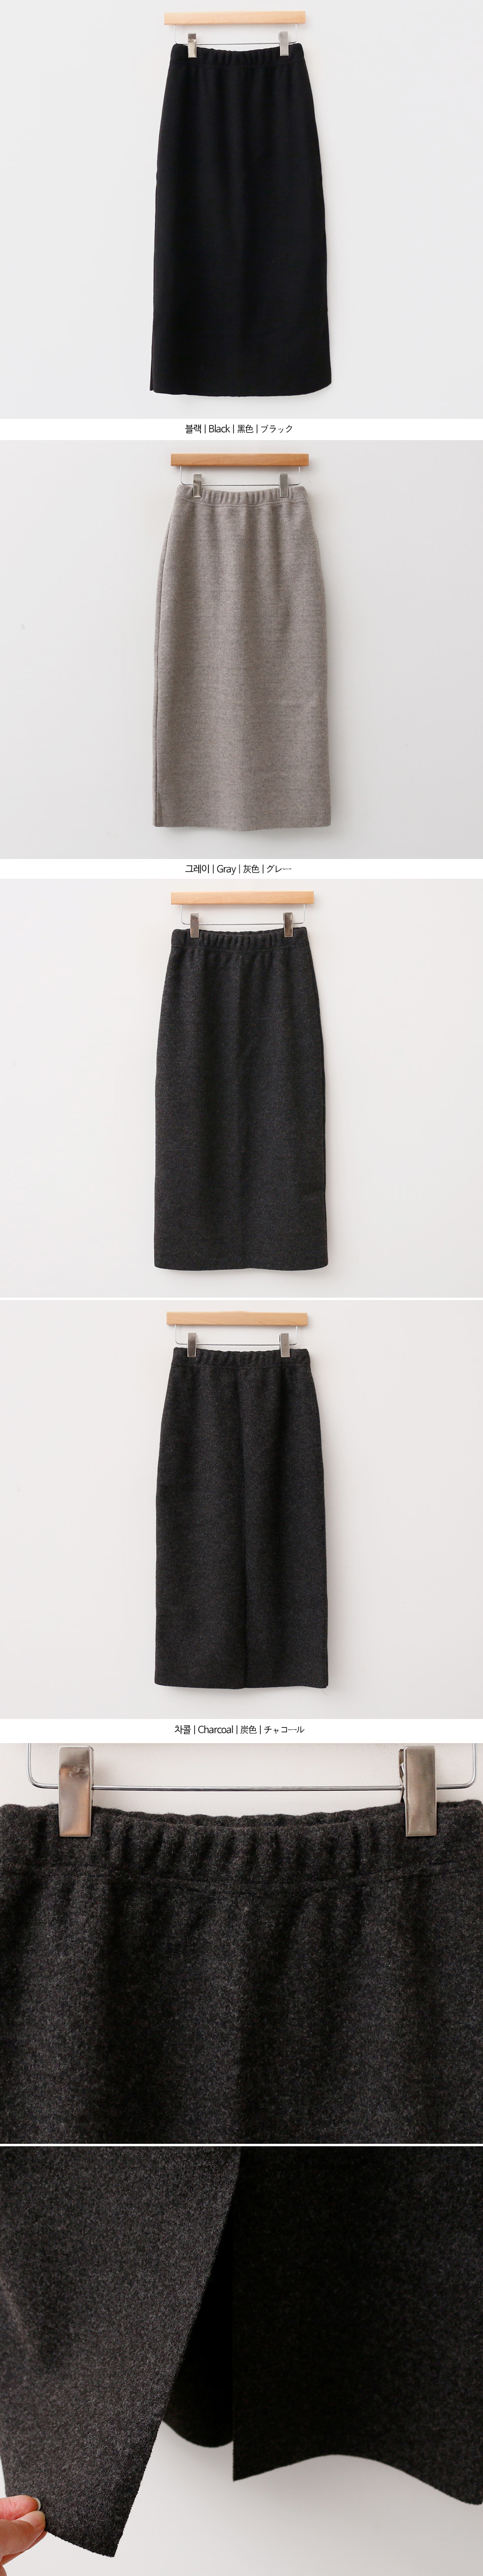 Warm short skirt